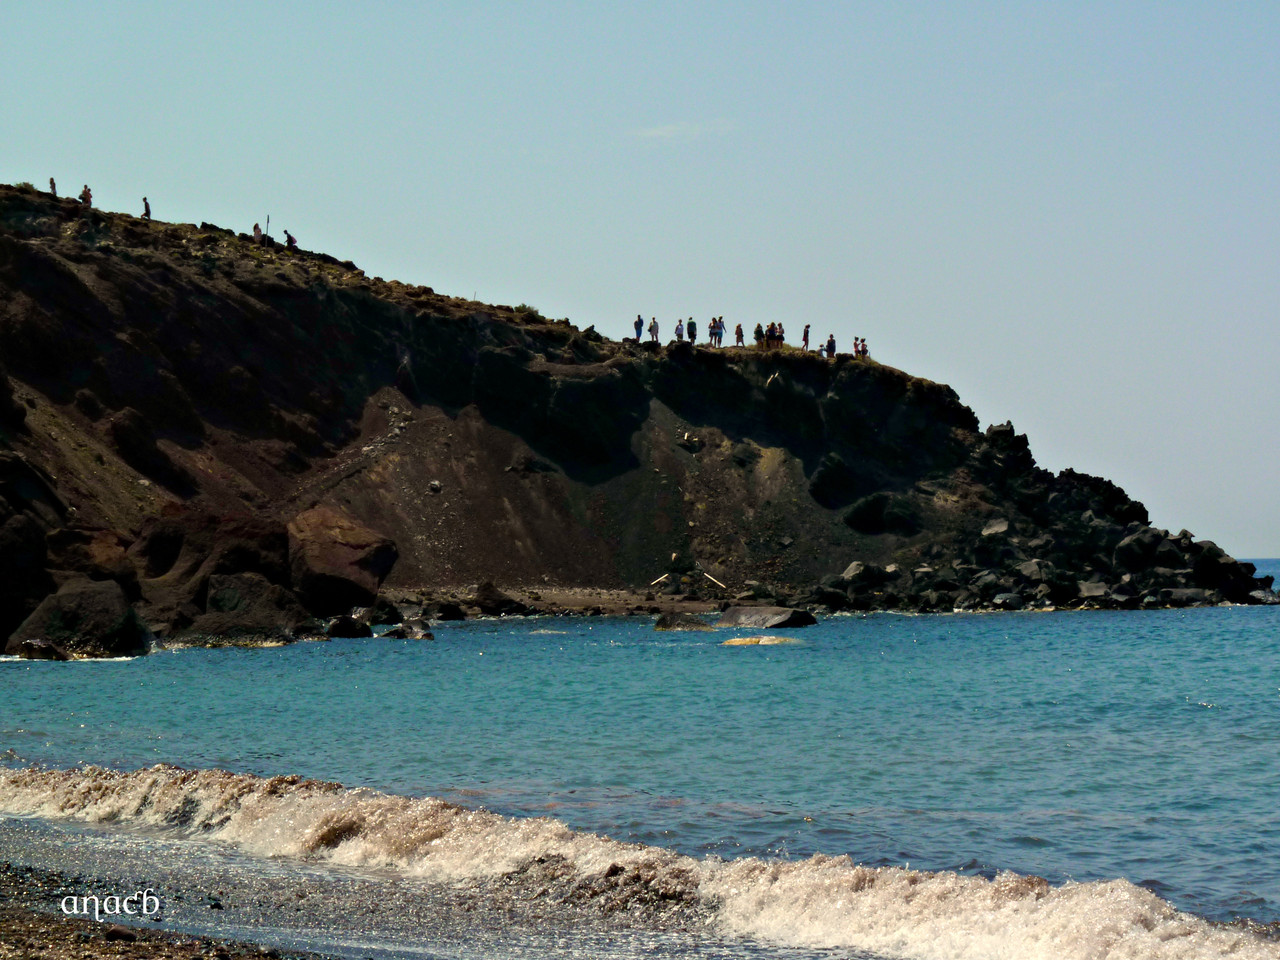 Santorini-Akrotiri-Praia Vermelha (1441) cópia as